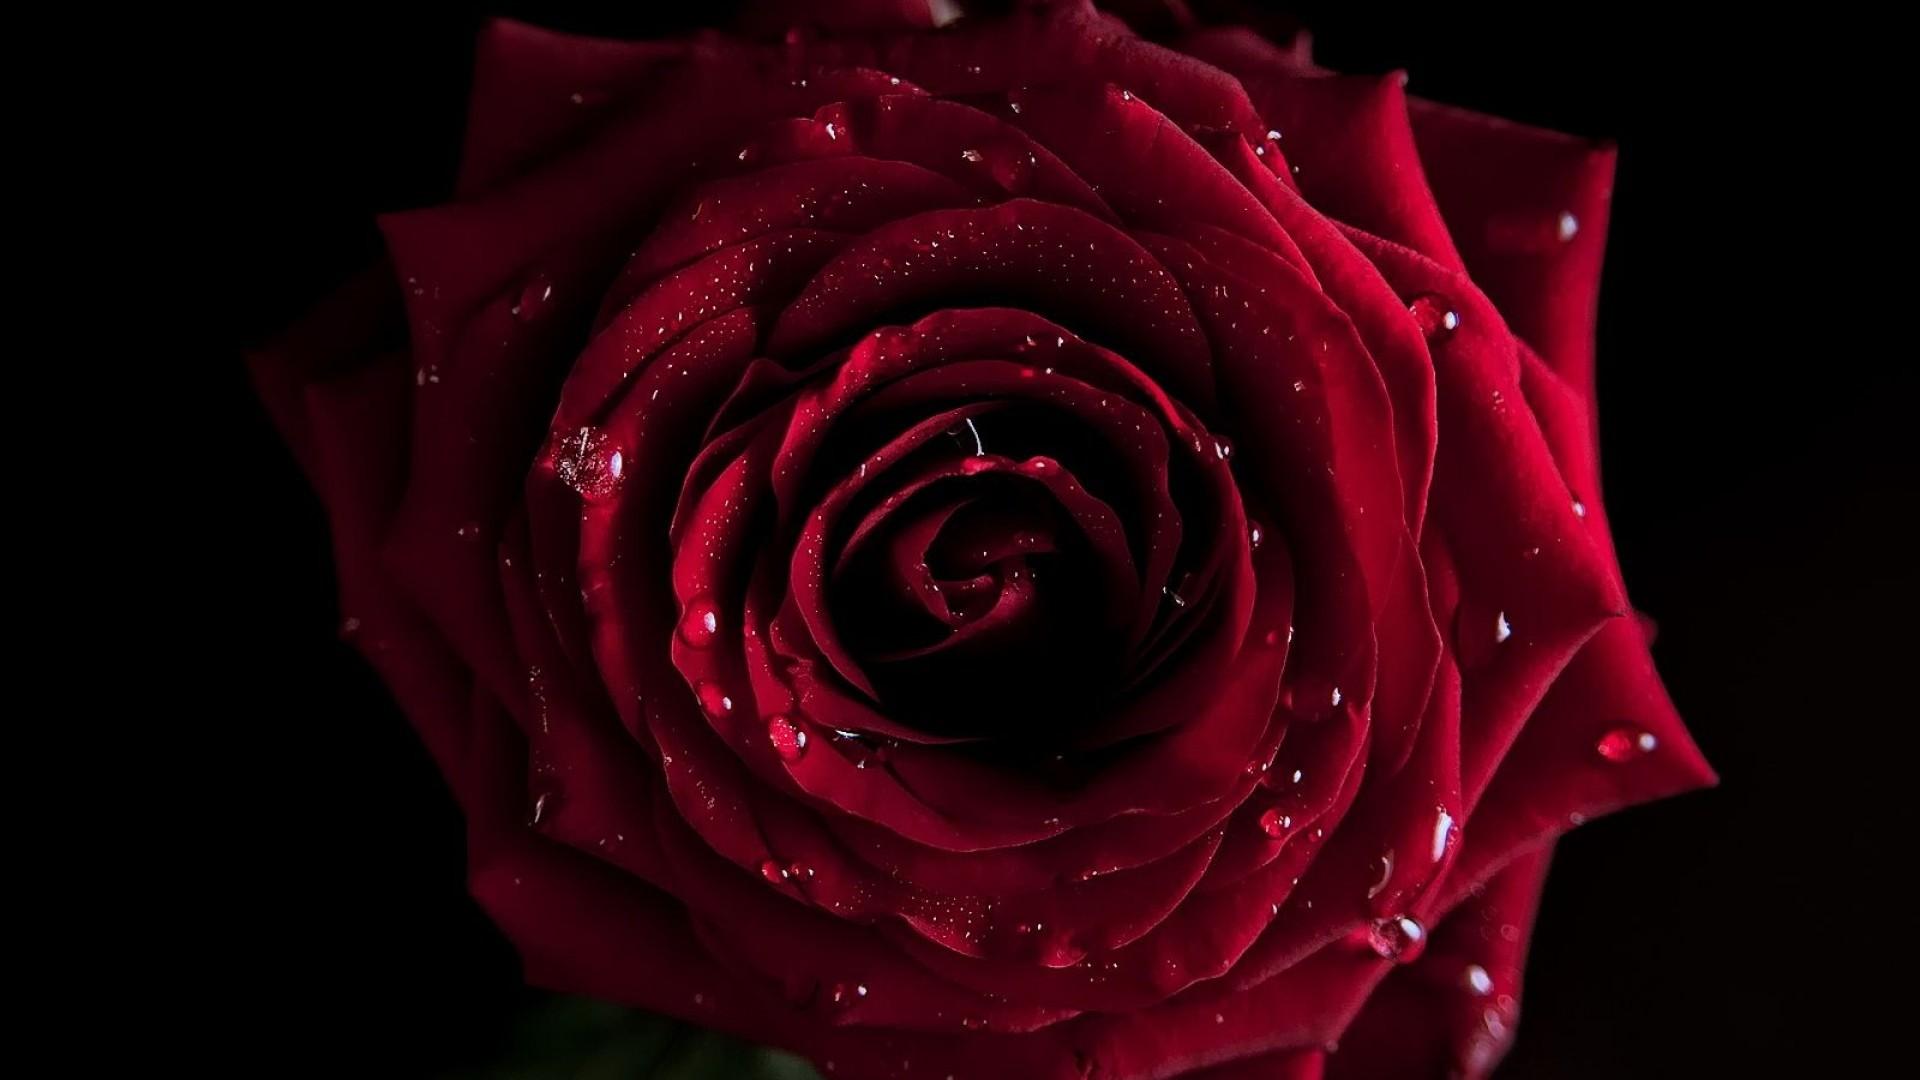 … Red Rose Wallpaper …